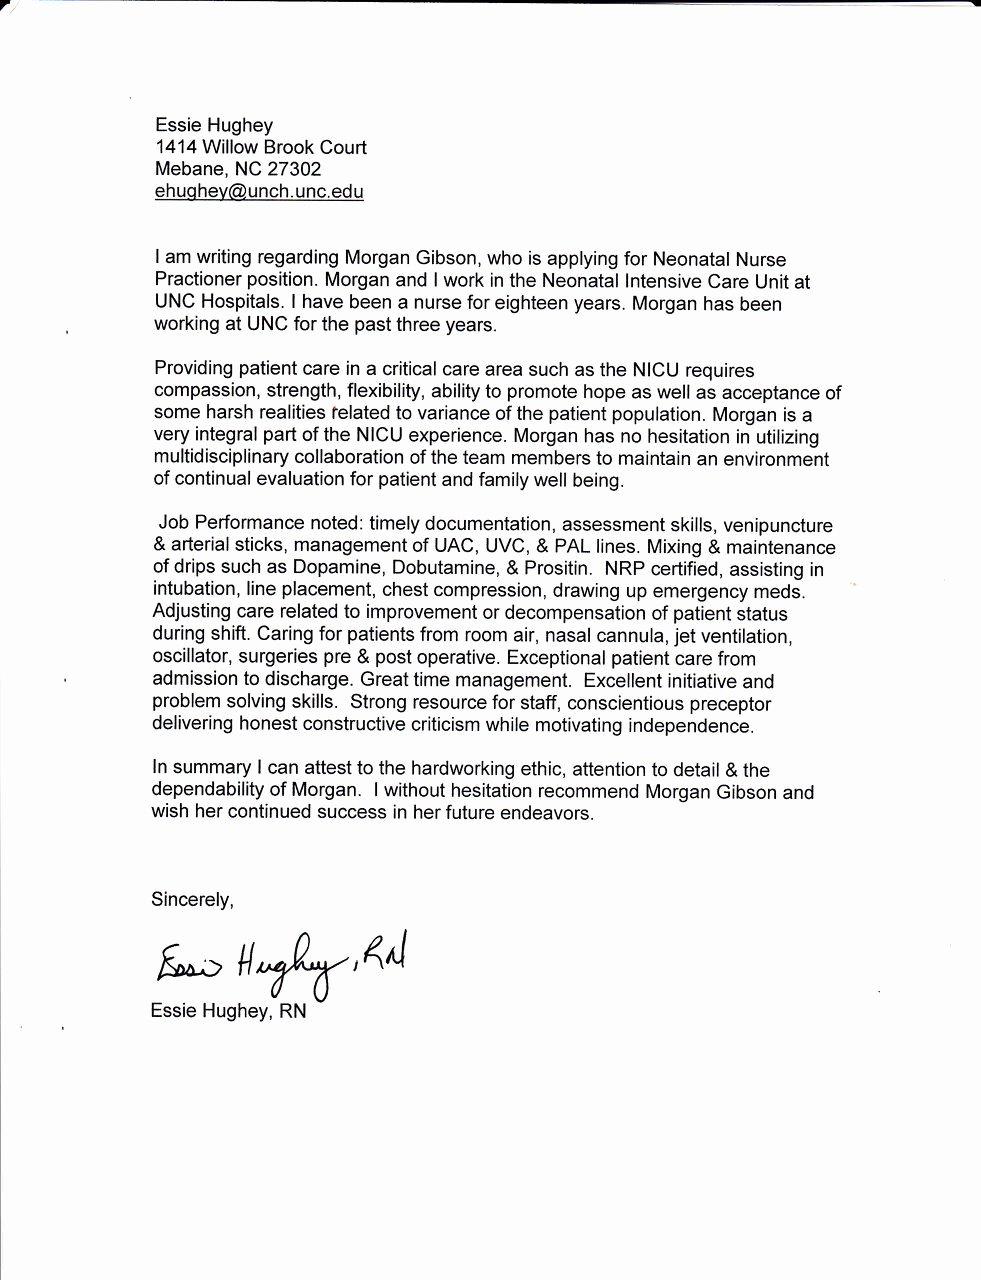 Nurse Practitioner Letter Of Recommendation Lovely Morgan Gibson Neonatal Nurse Practitioner